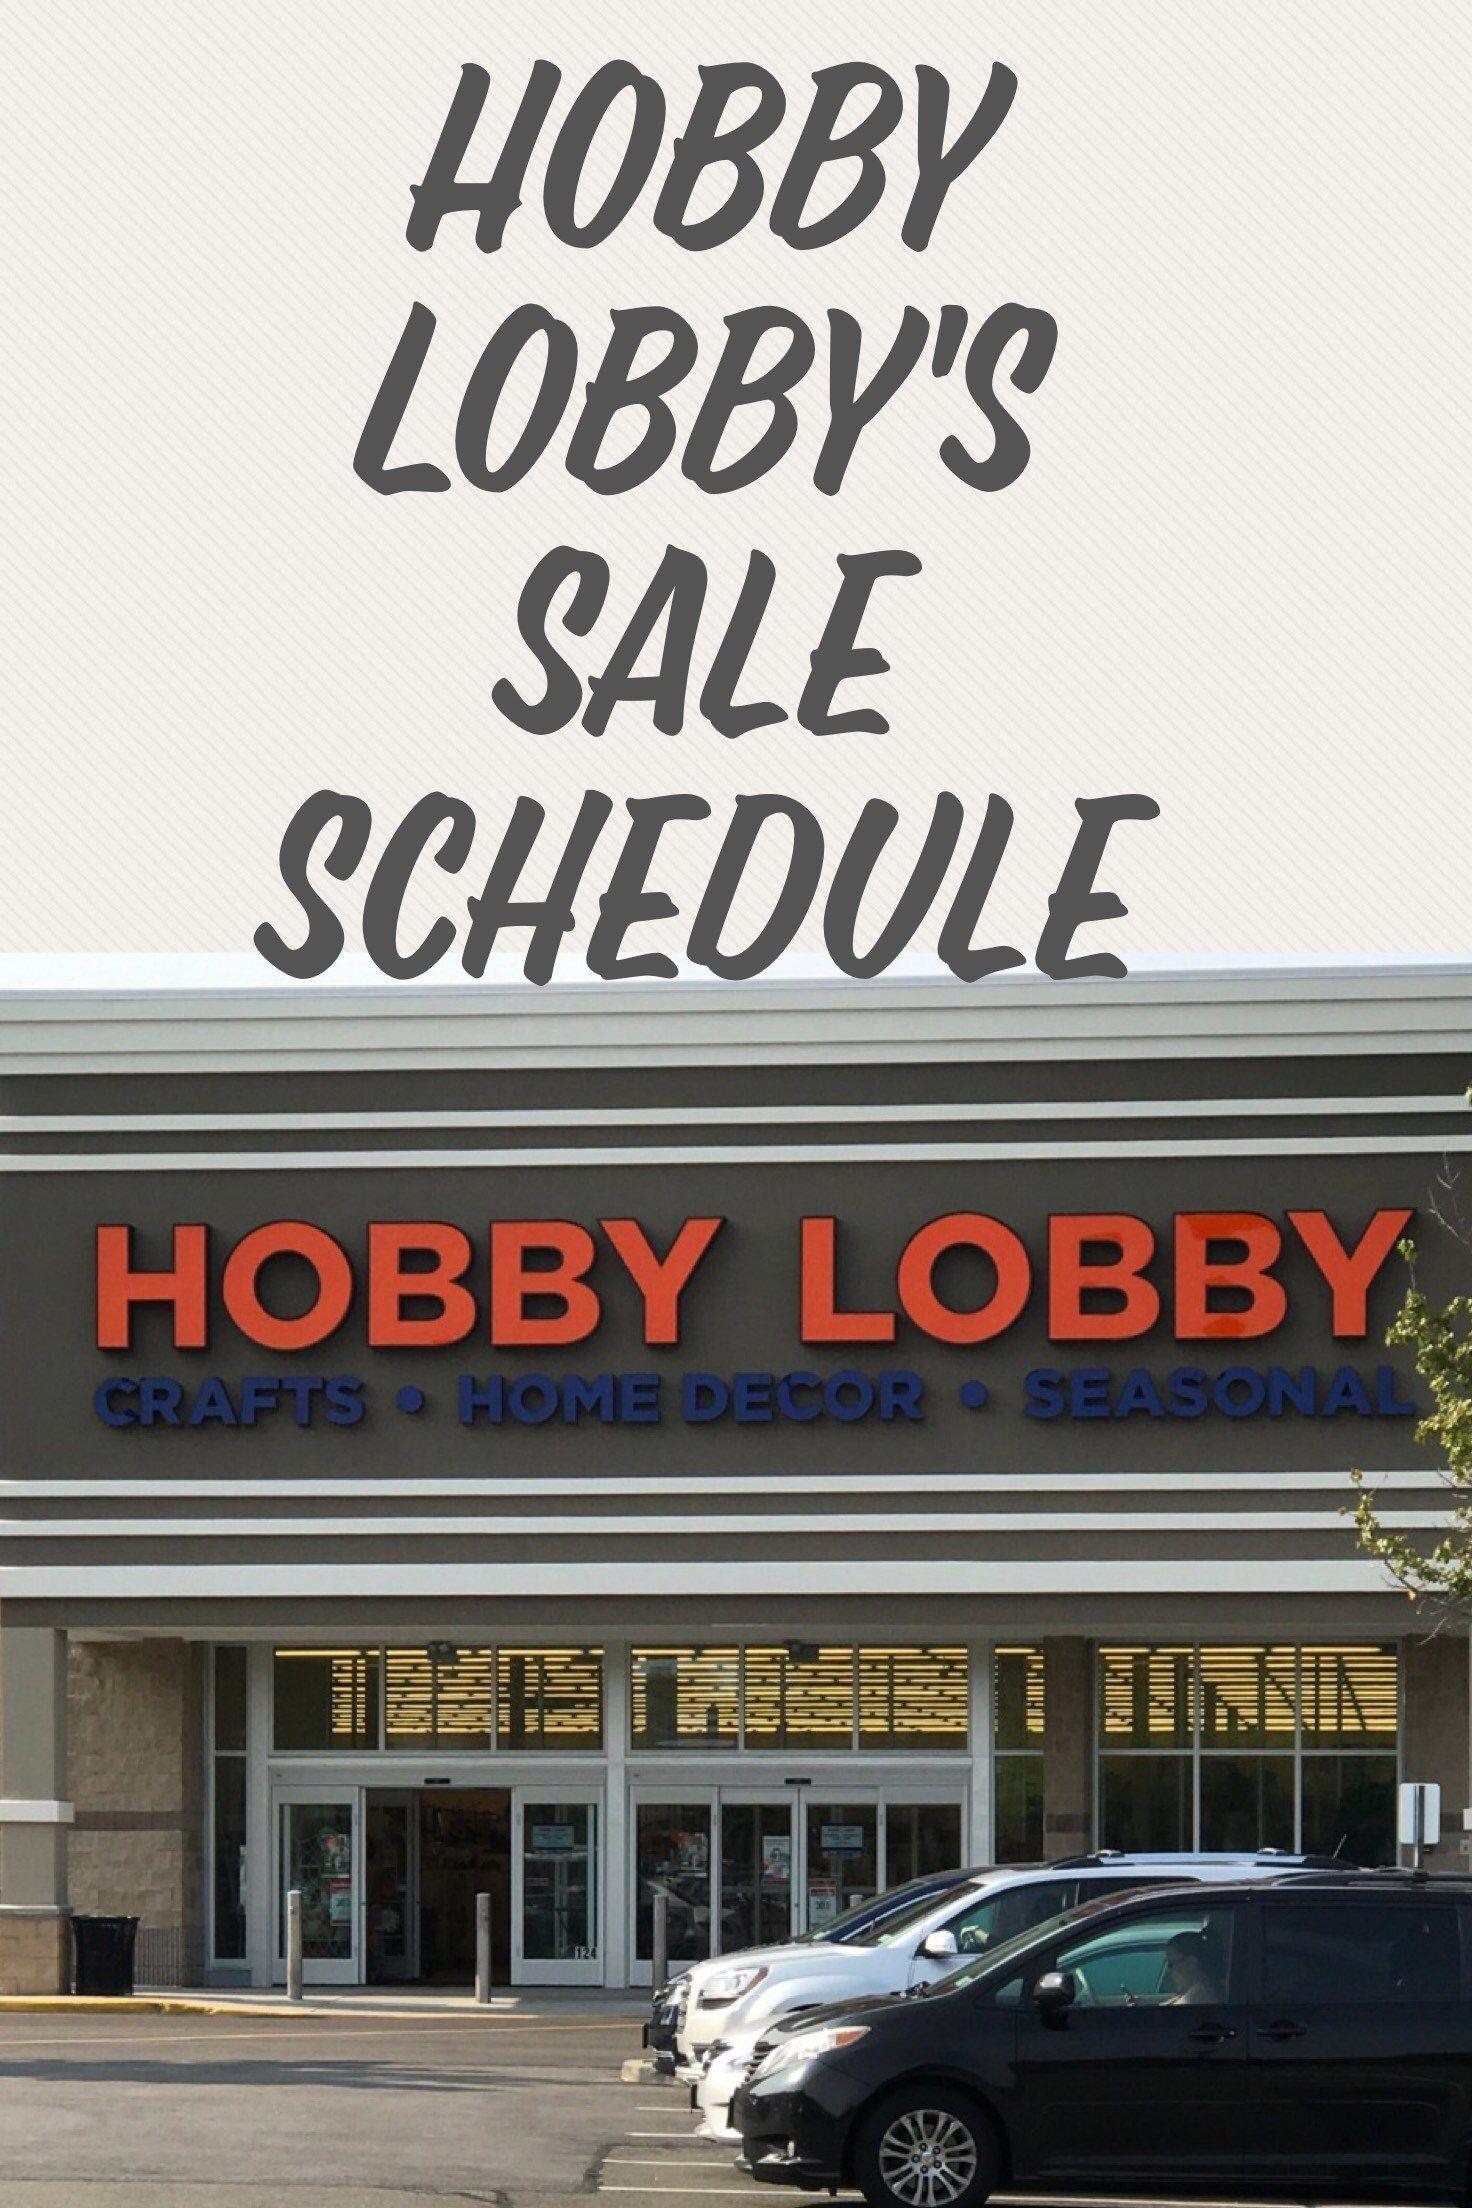 Hobby Lobby's Sale Schedule Hobby lobby sales, Hobby